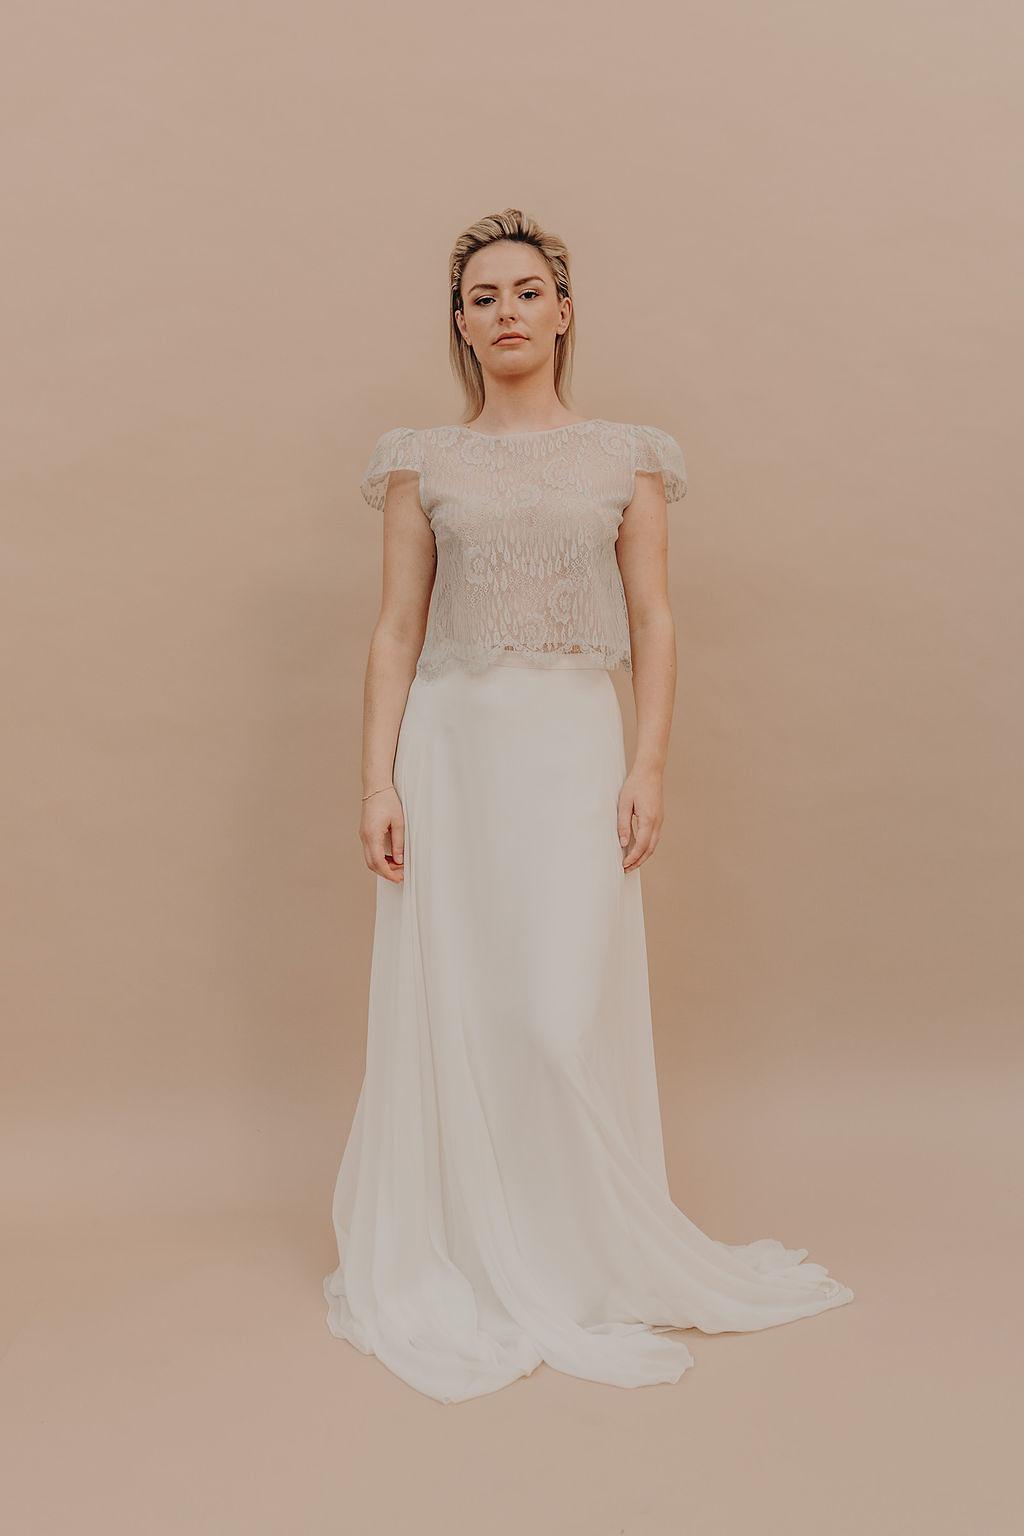 7_top_dv_mariage_créateur_lyon_rhône_alpes